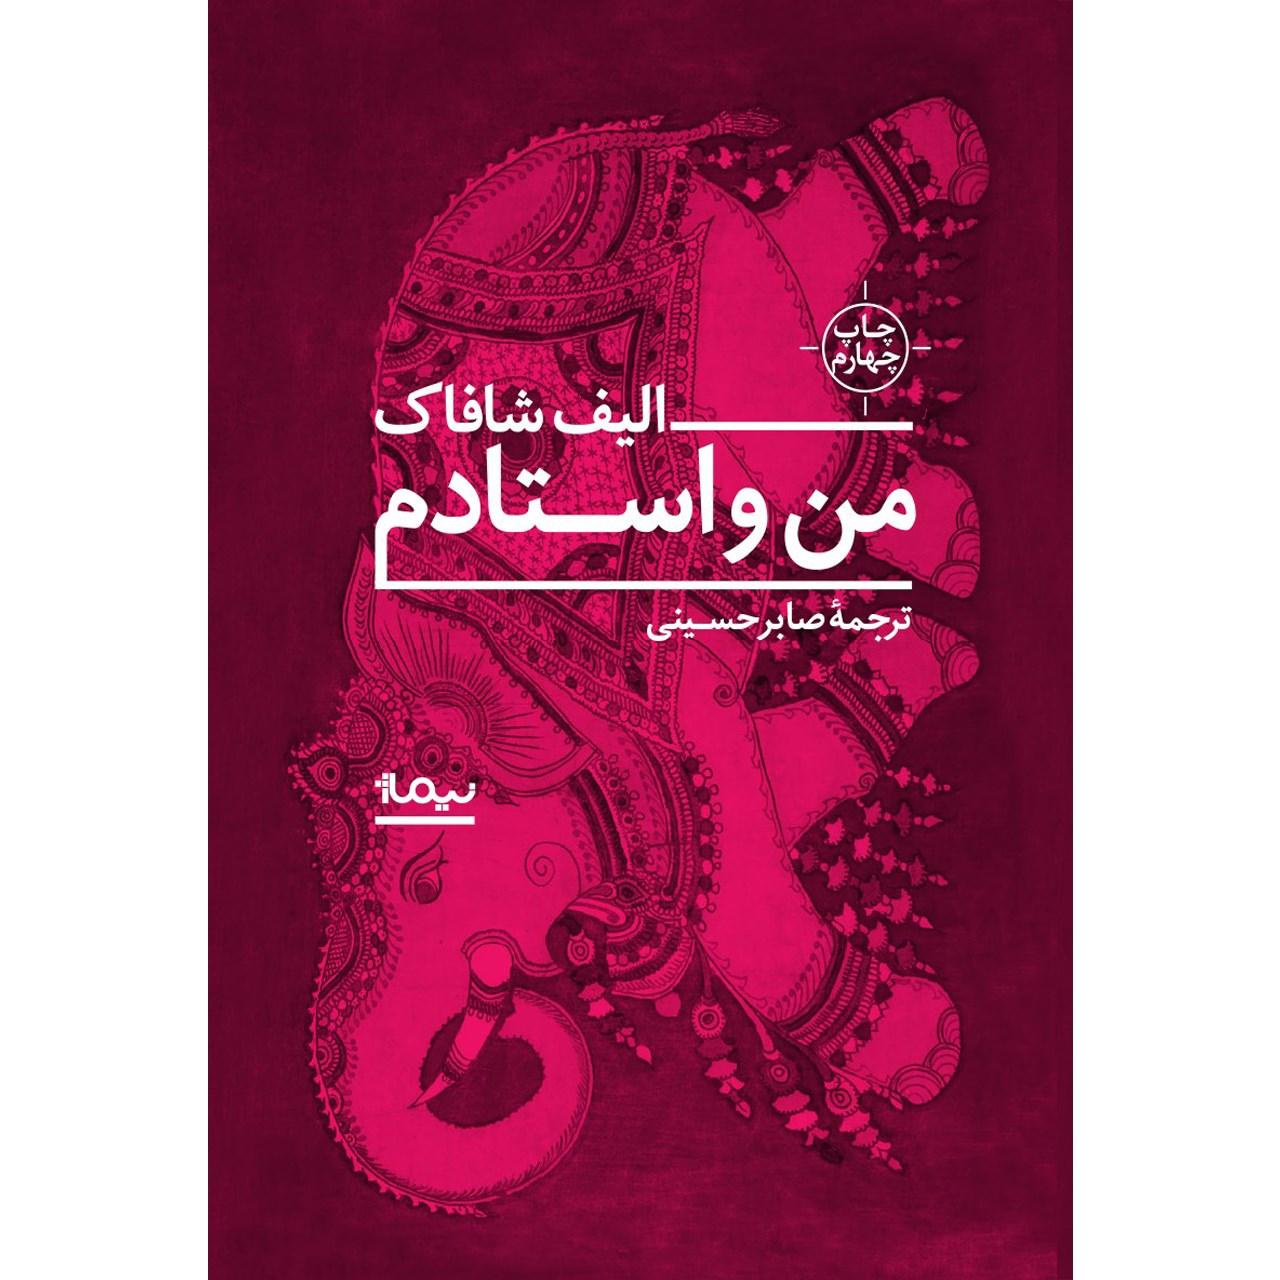 کتاب من و استادم اثر الیف شافاک